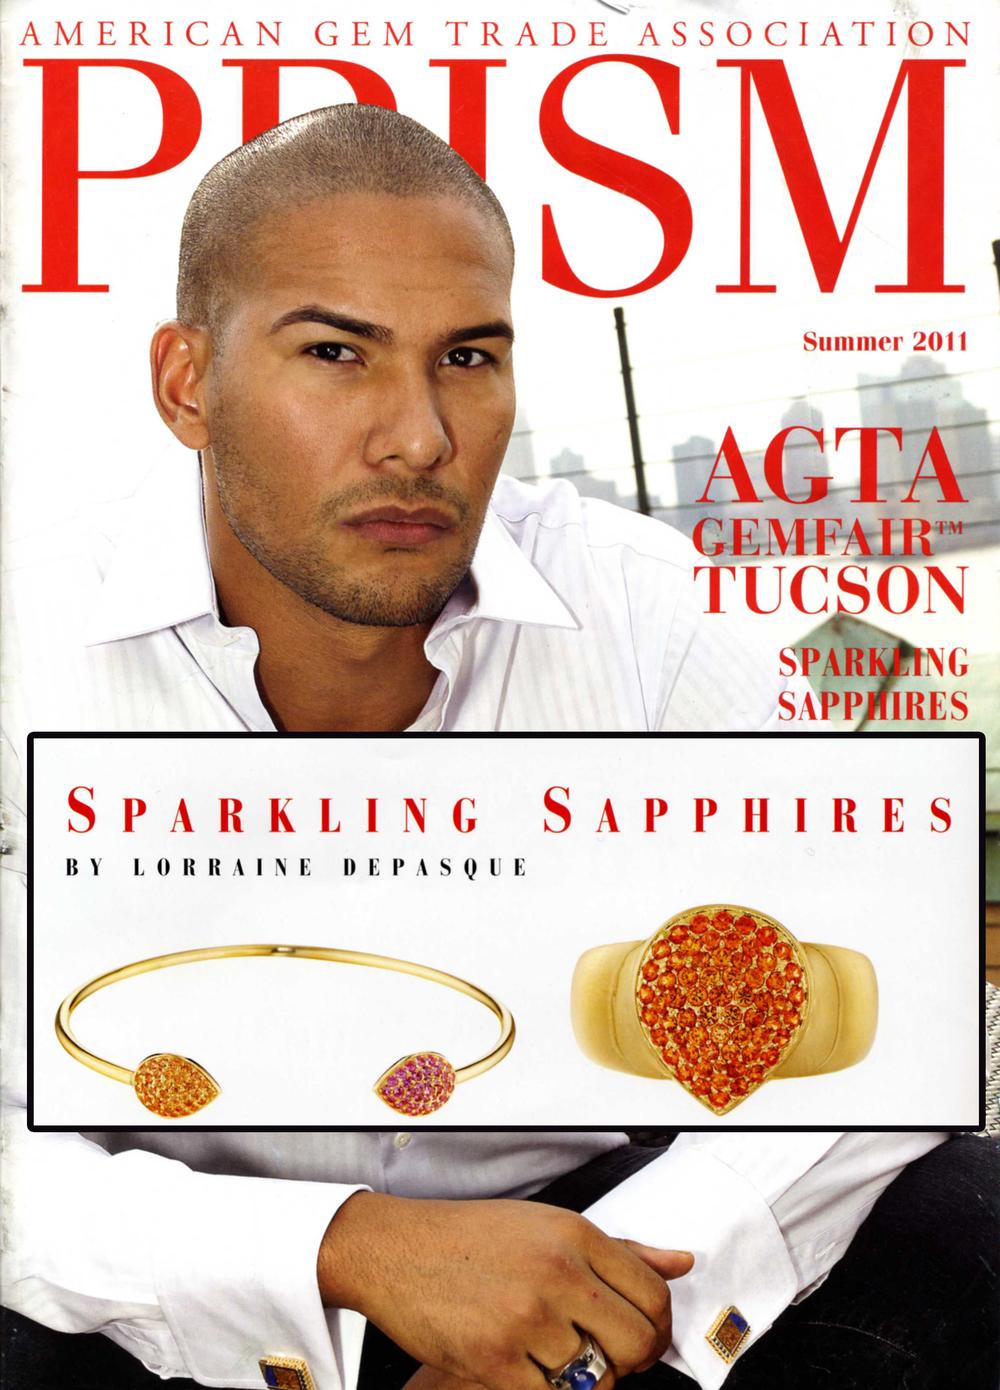 2011-7-agta cover summer.jpg